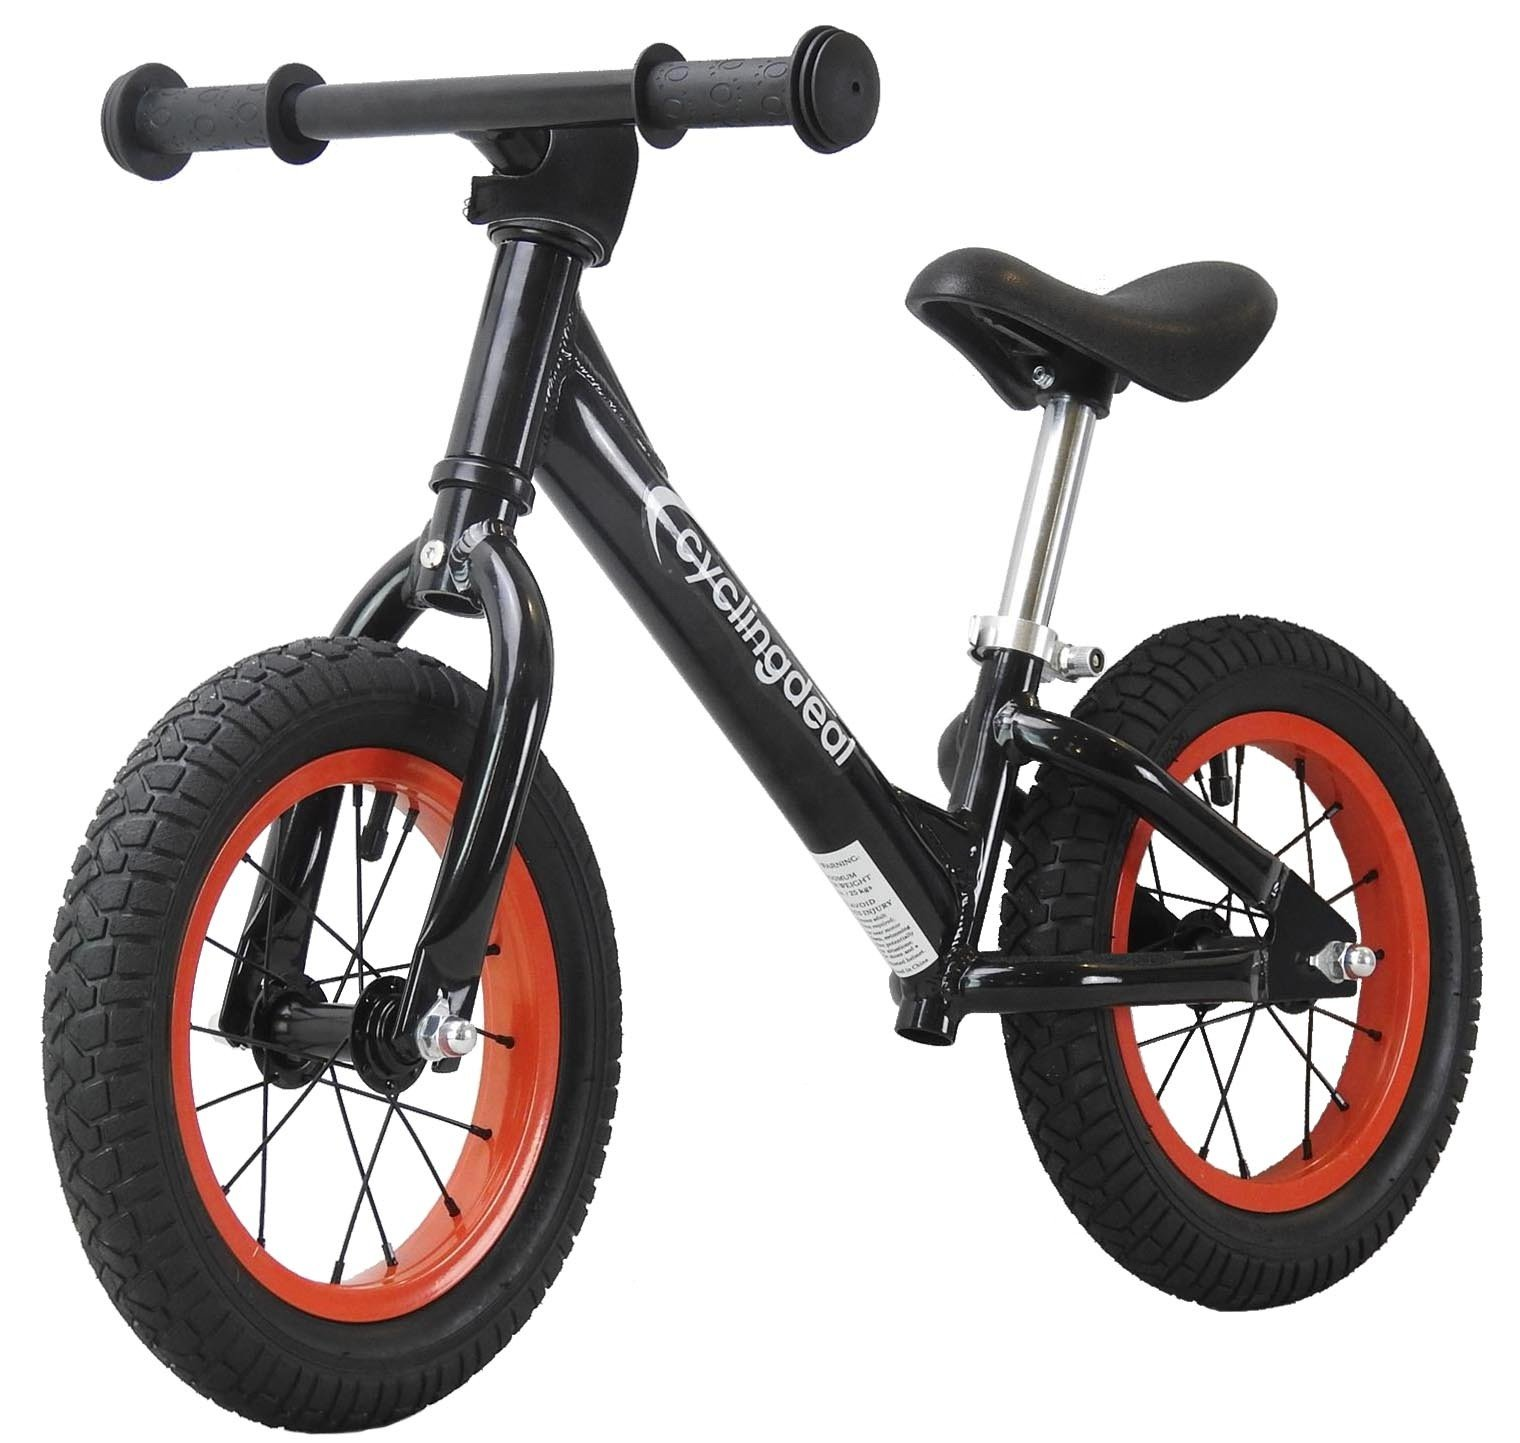 CyclingDeal Alloy Kids Push Balance No-Pedal Bike 12'' Black by CyclingDeal (Image #1)